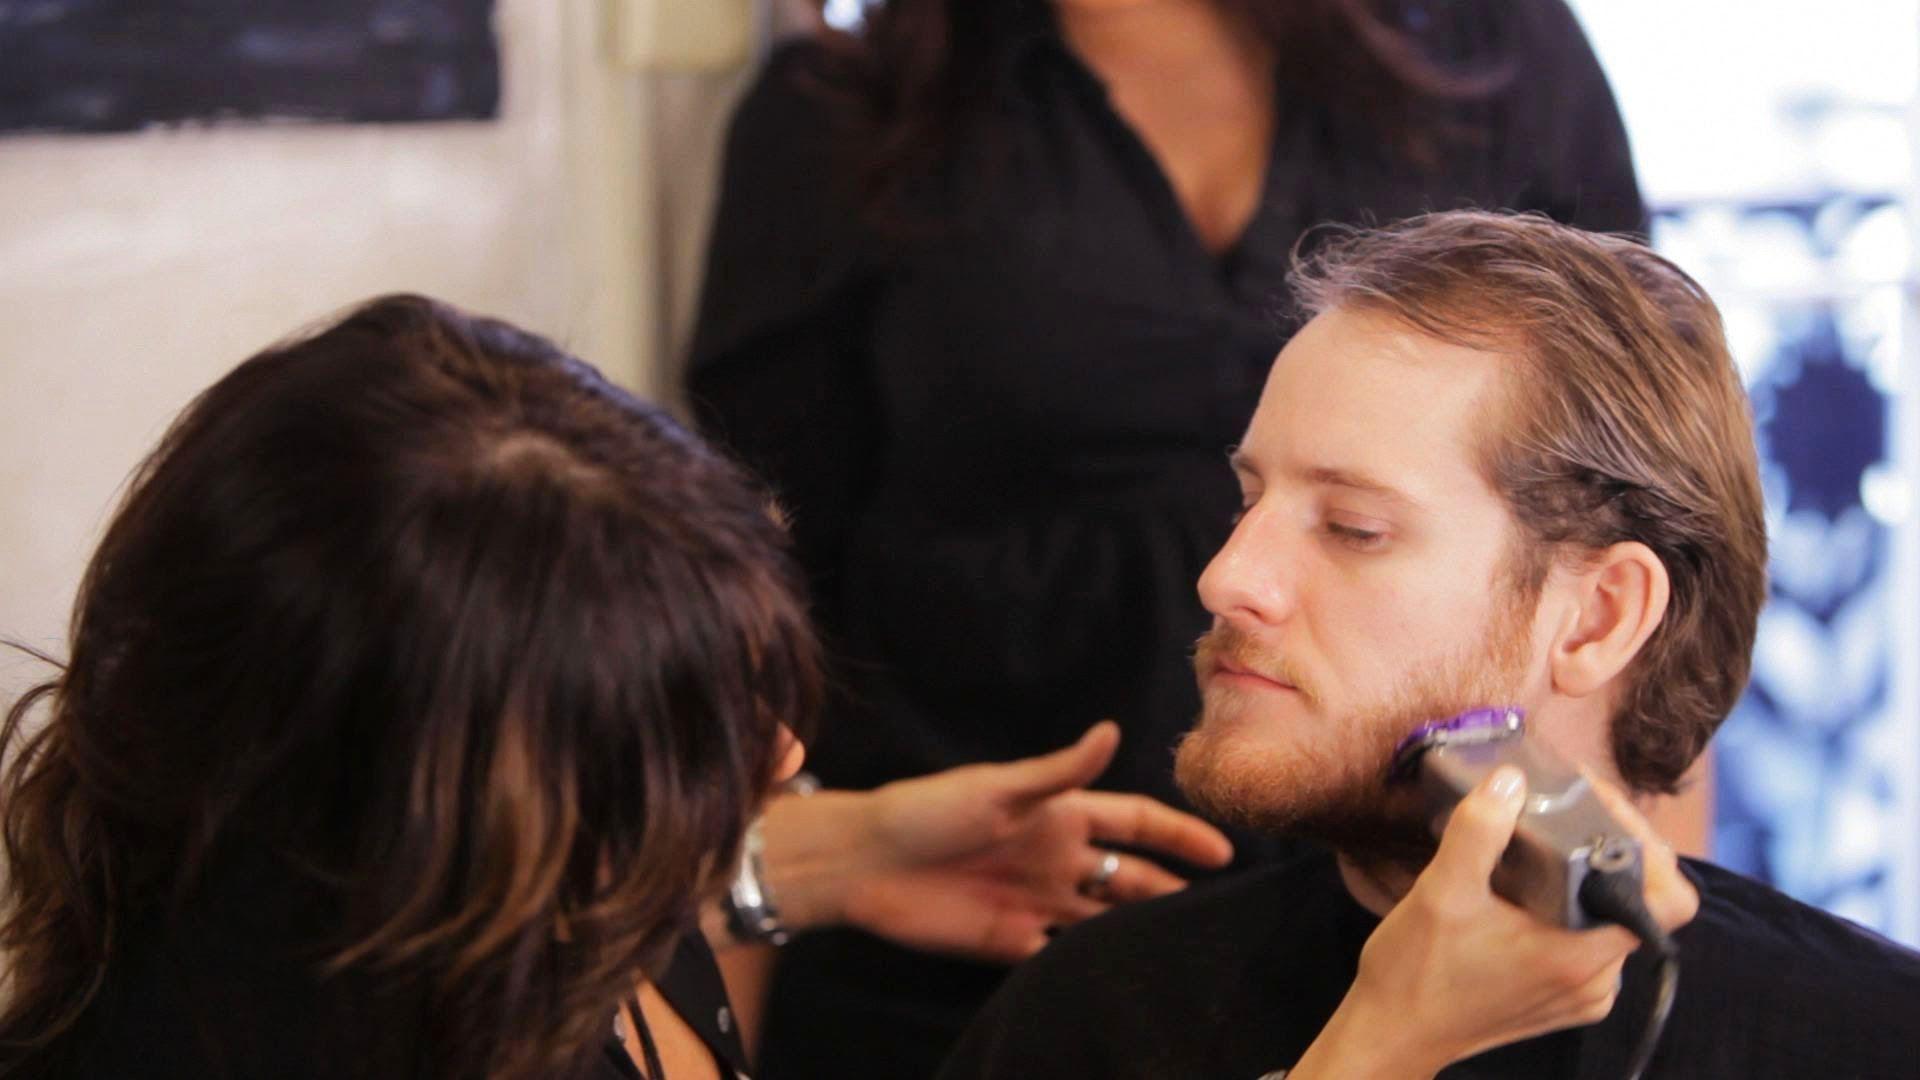 Boy hairstyle full hd how to trim a beard  menus grooming  soins homme  pinterest